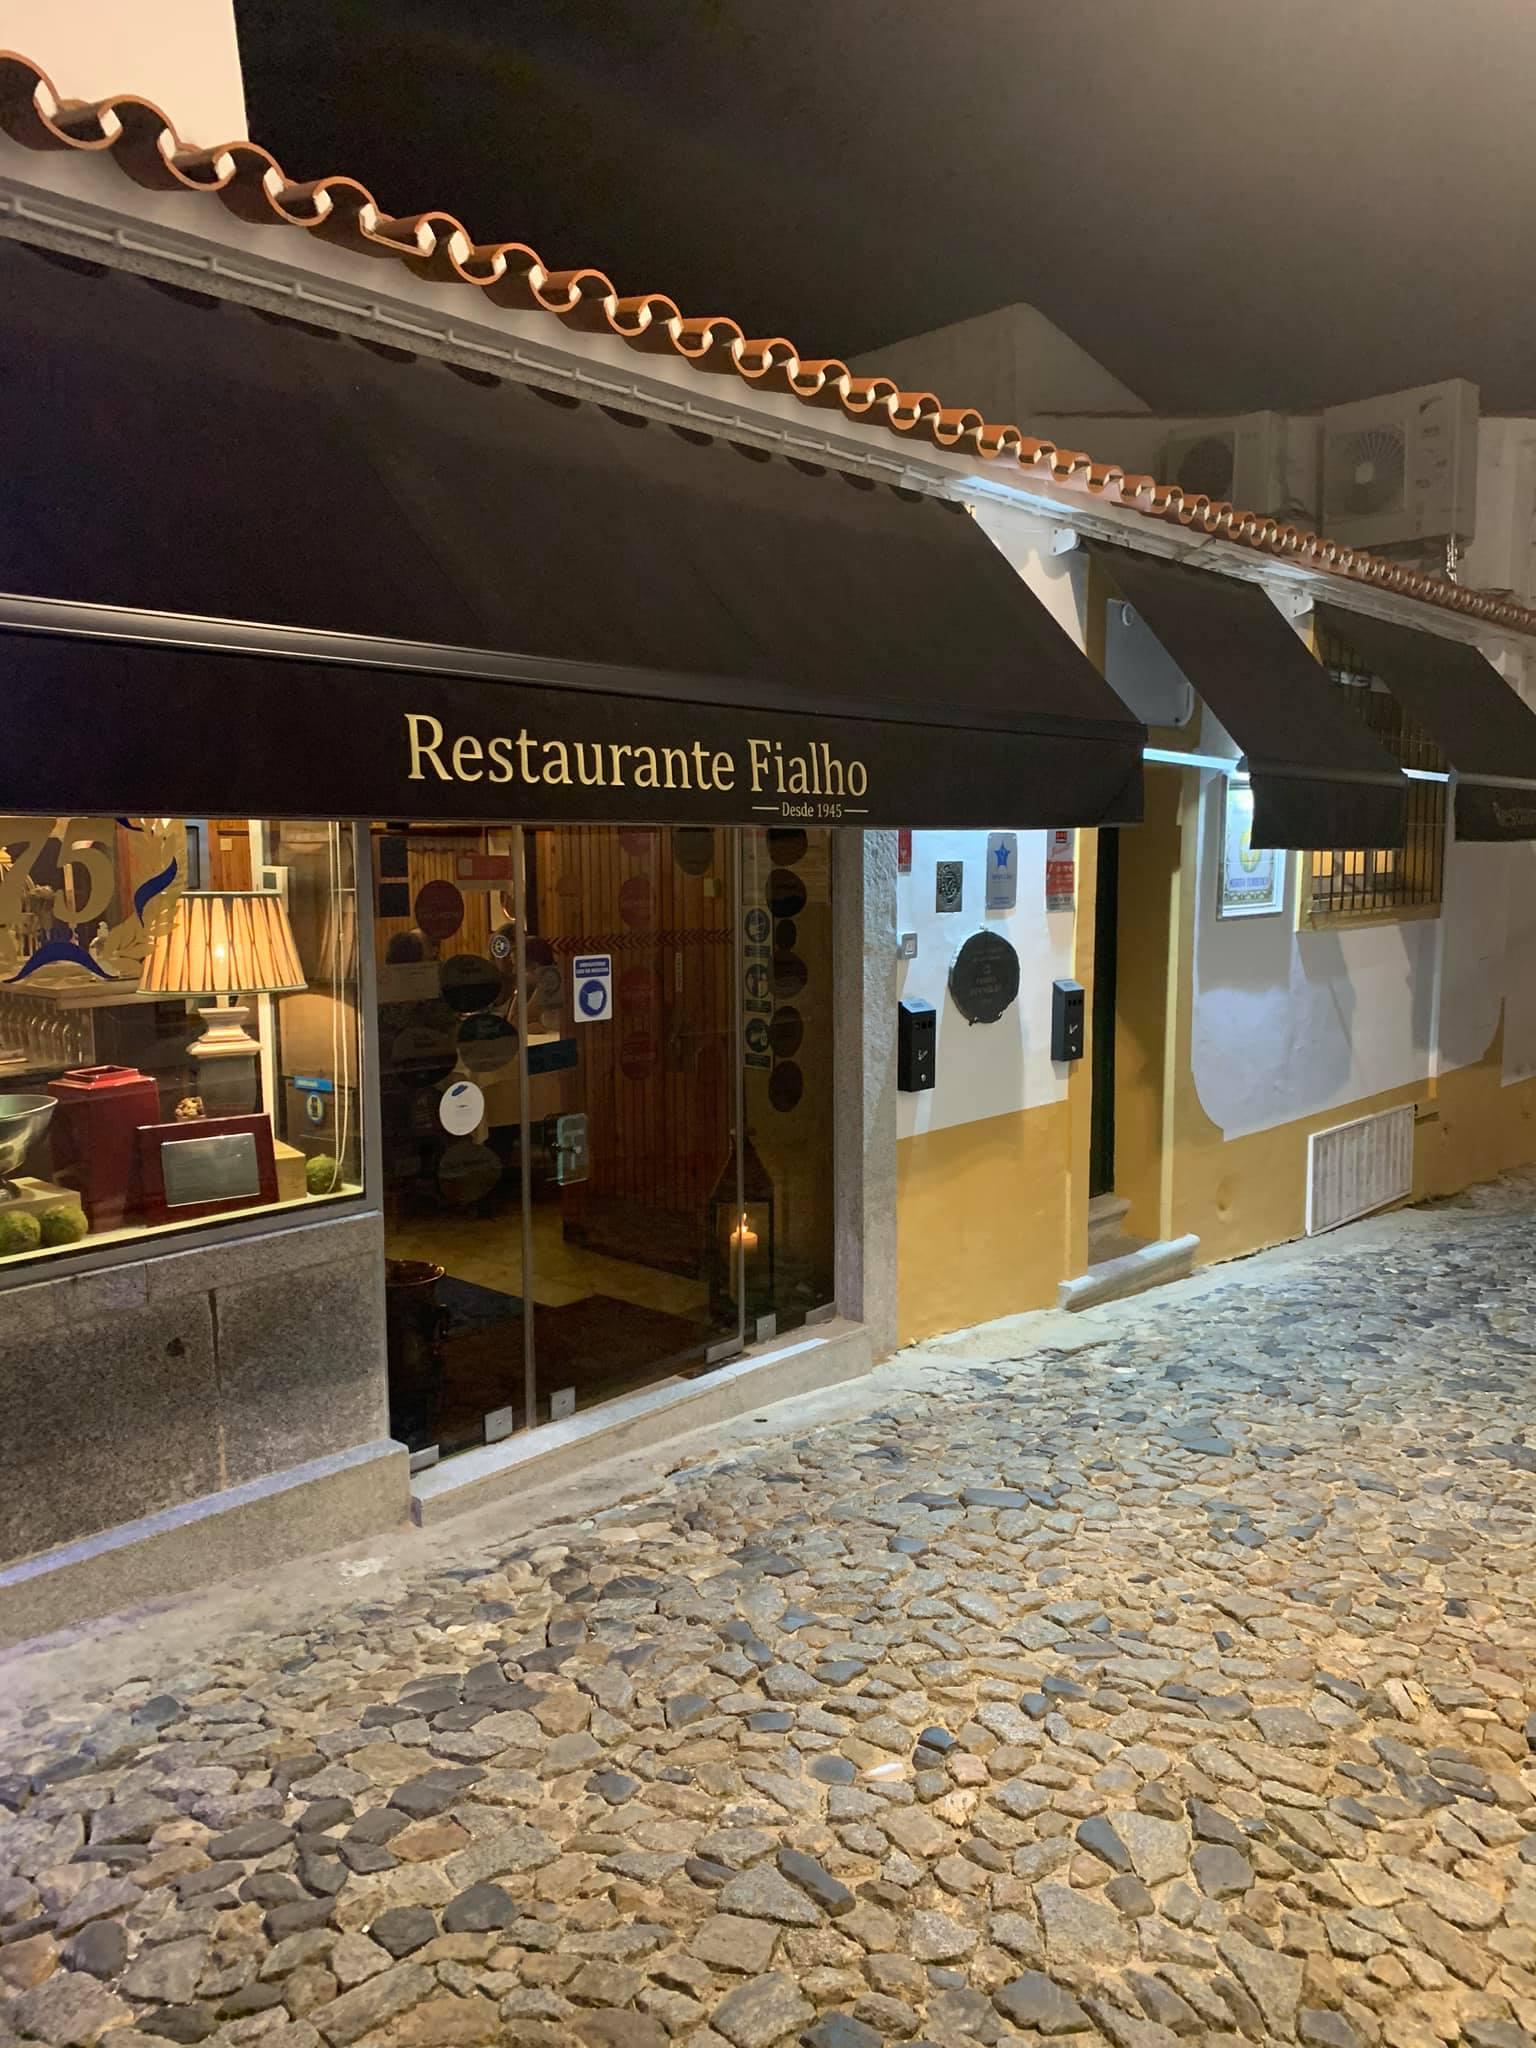 restaurante fialho alentejo portugal